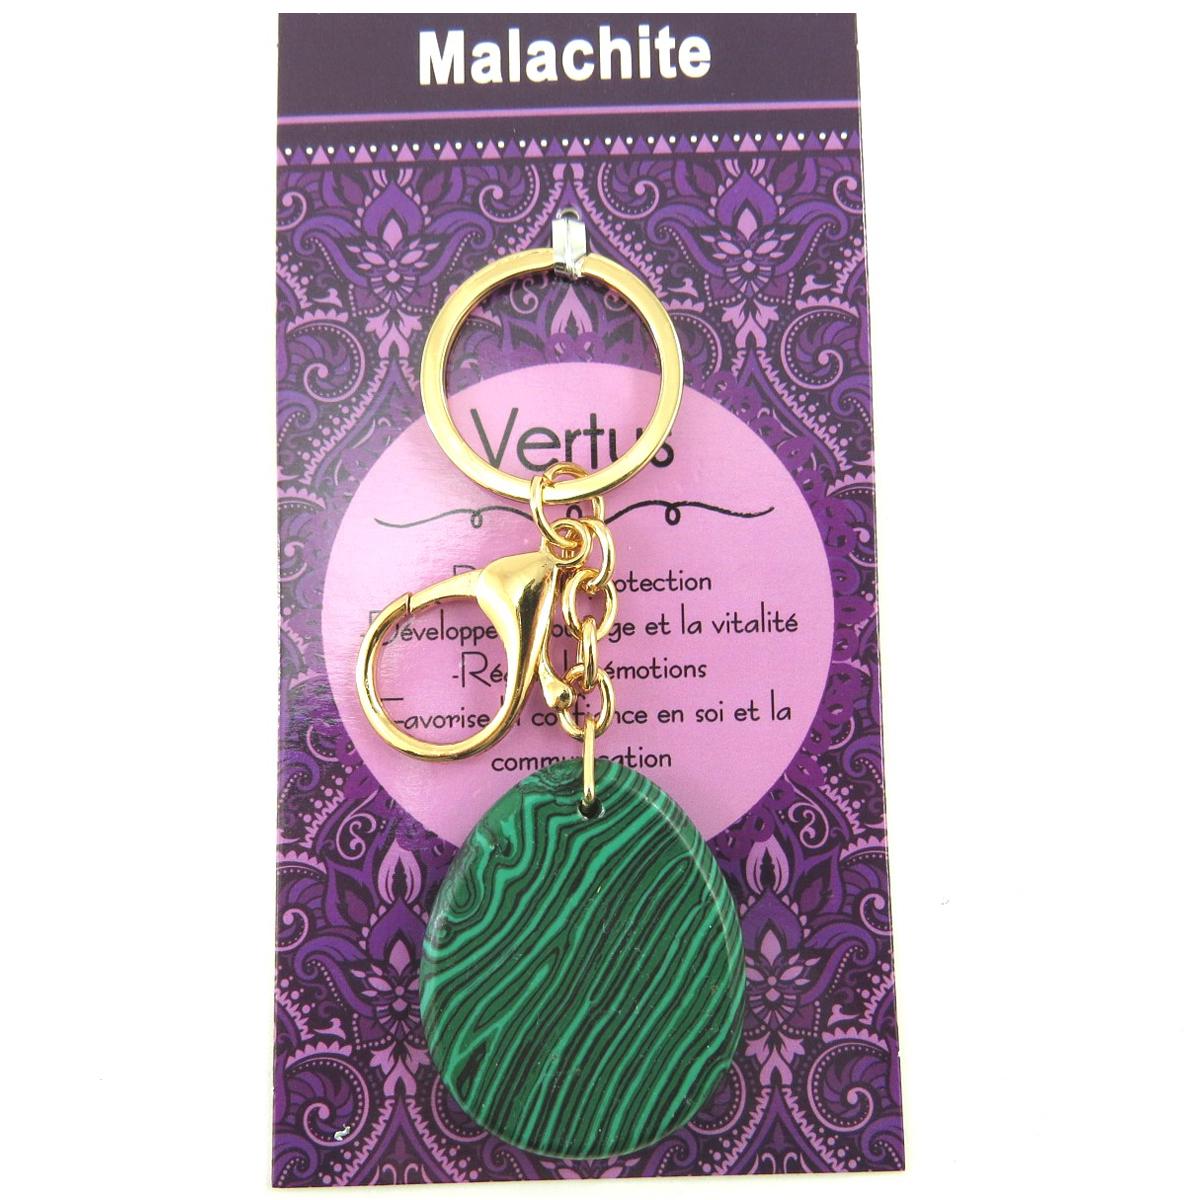 Porte-clés, bijou de sac \'Mineralia\' vert malachite - 10 cm, pierre 40x35 mm - [Q7680]